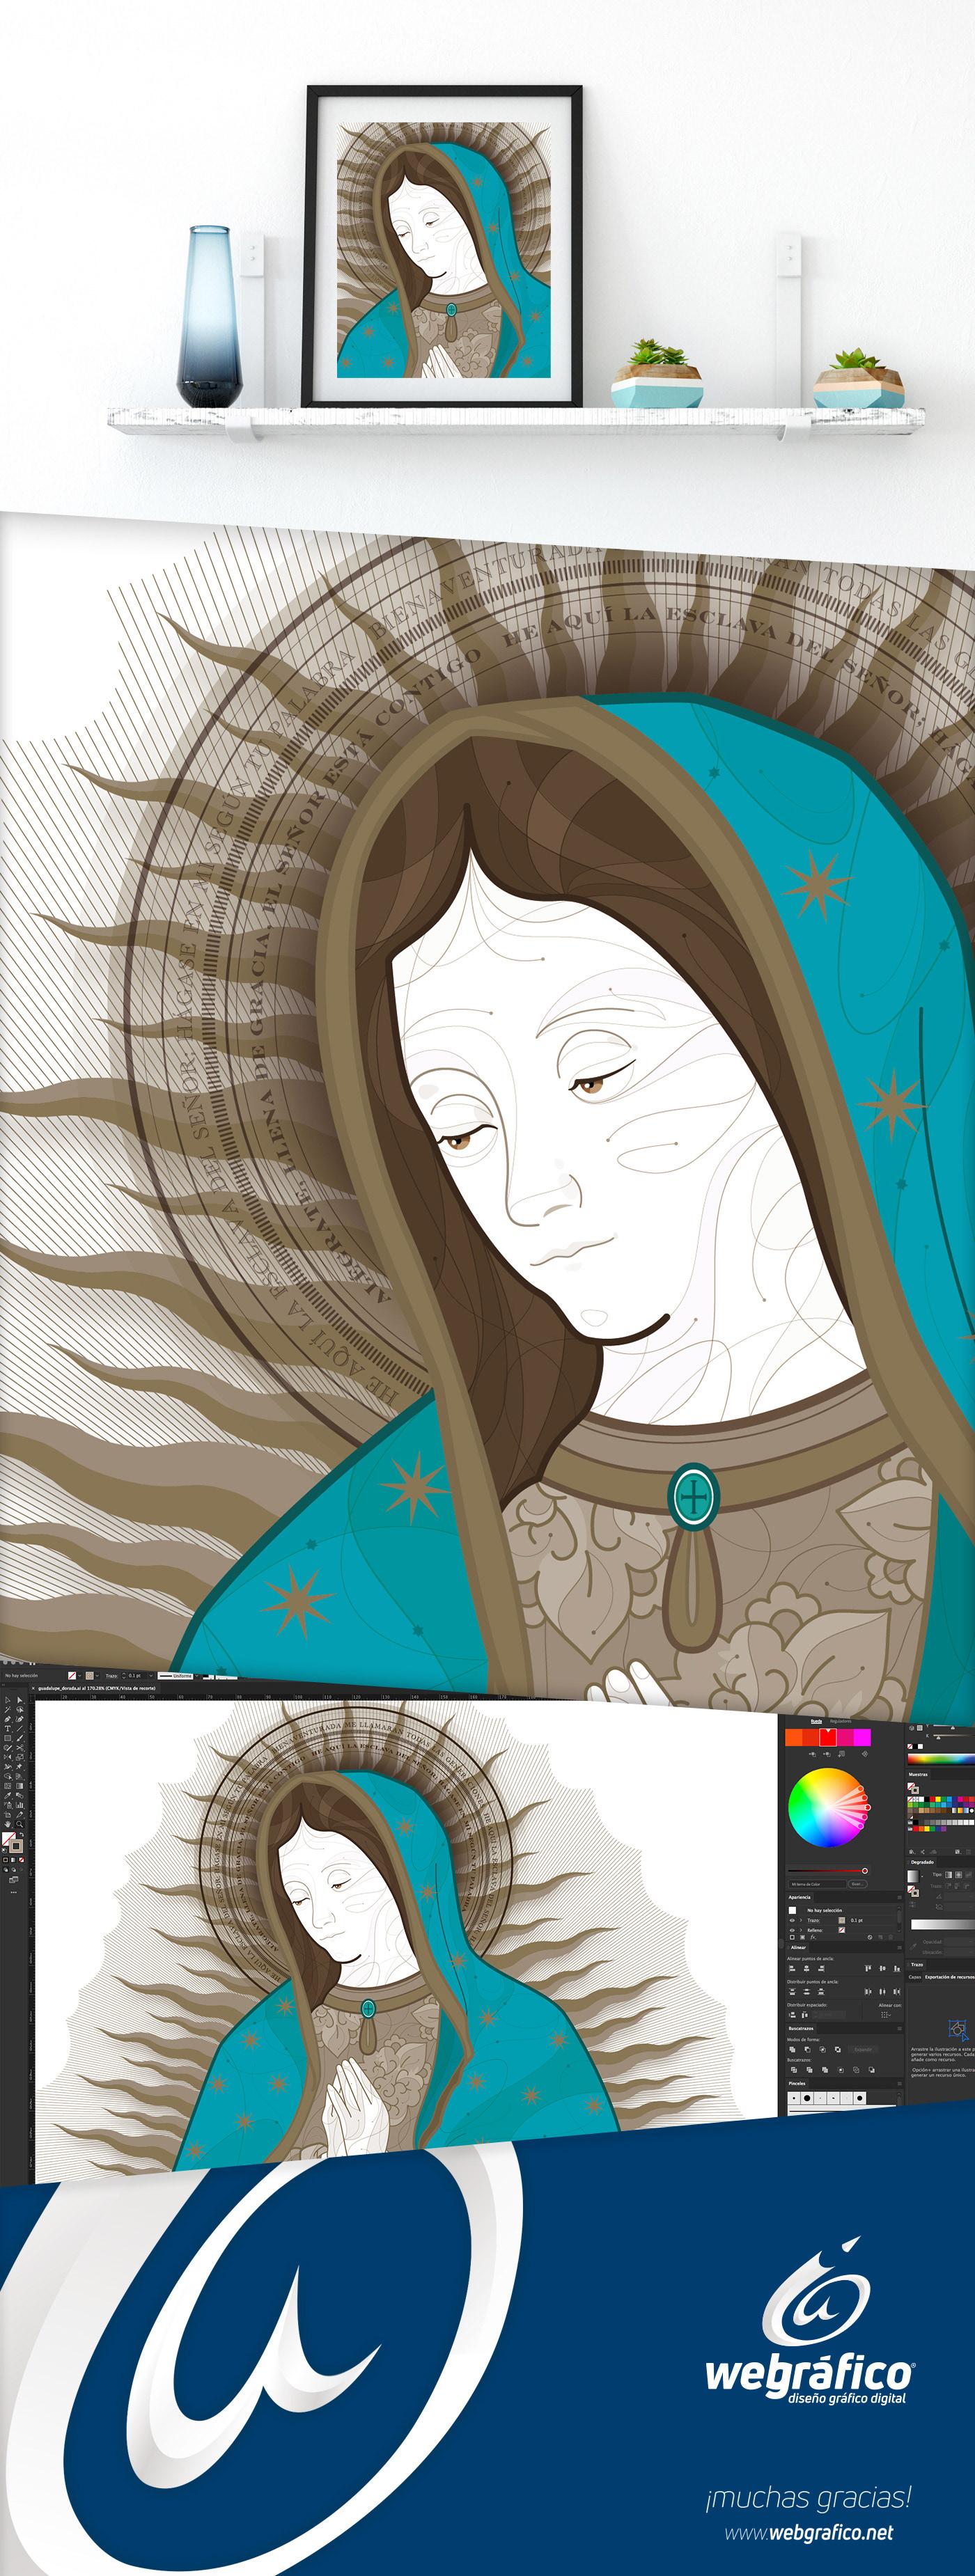 virgen miguel colunga aguascalientes mexico ilustracion webgrafico Guadalupe maria católico